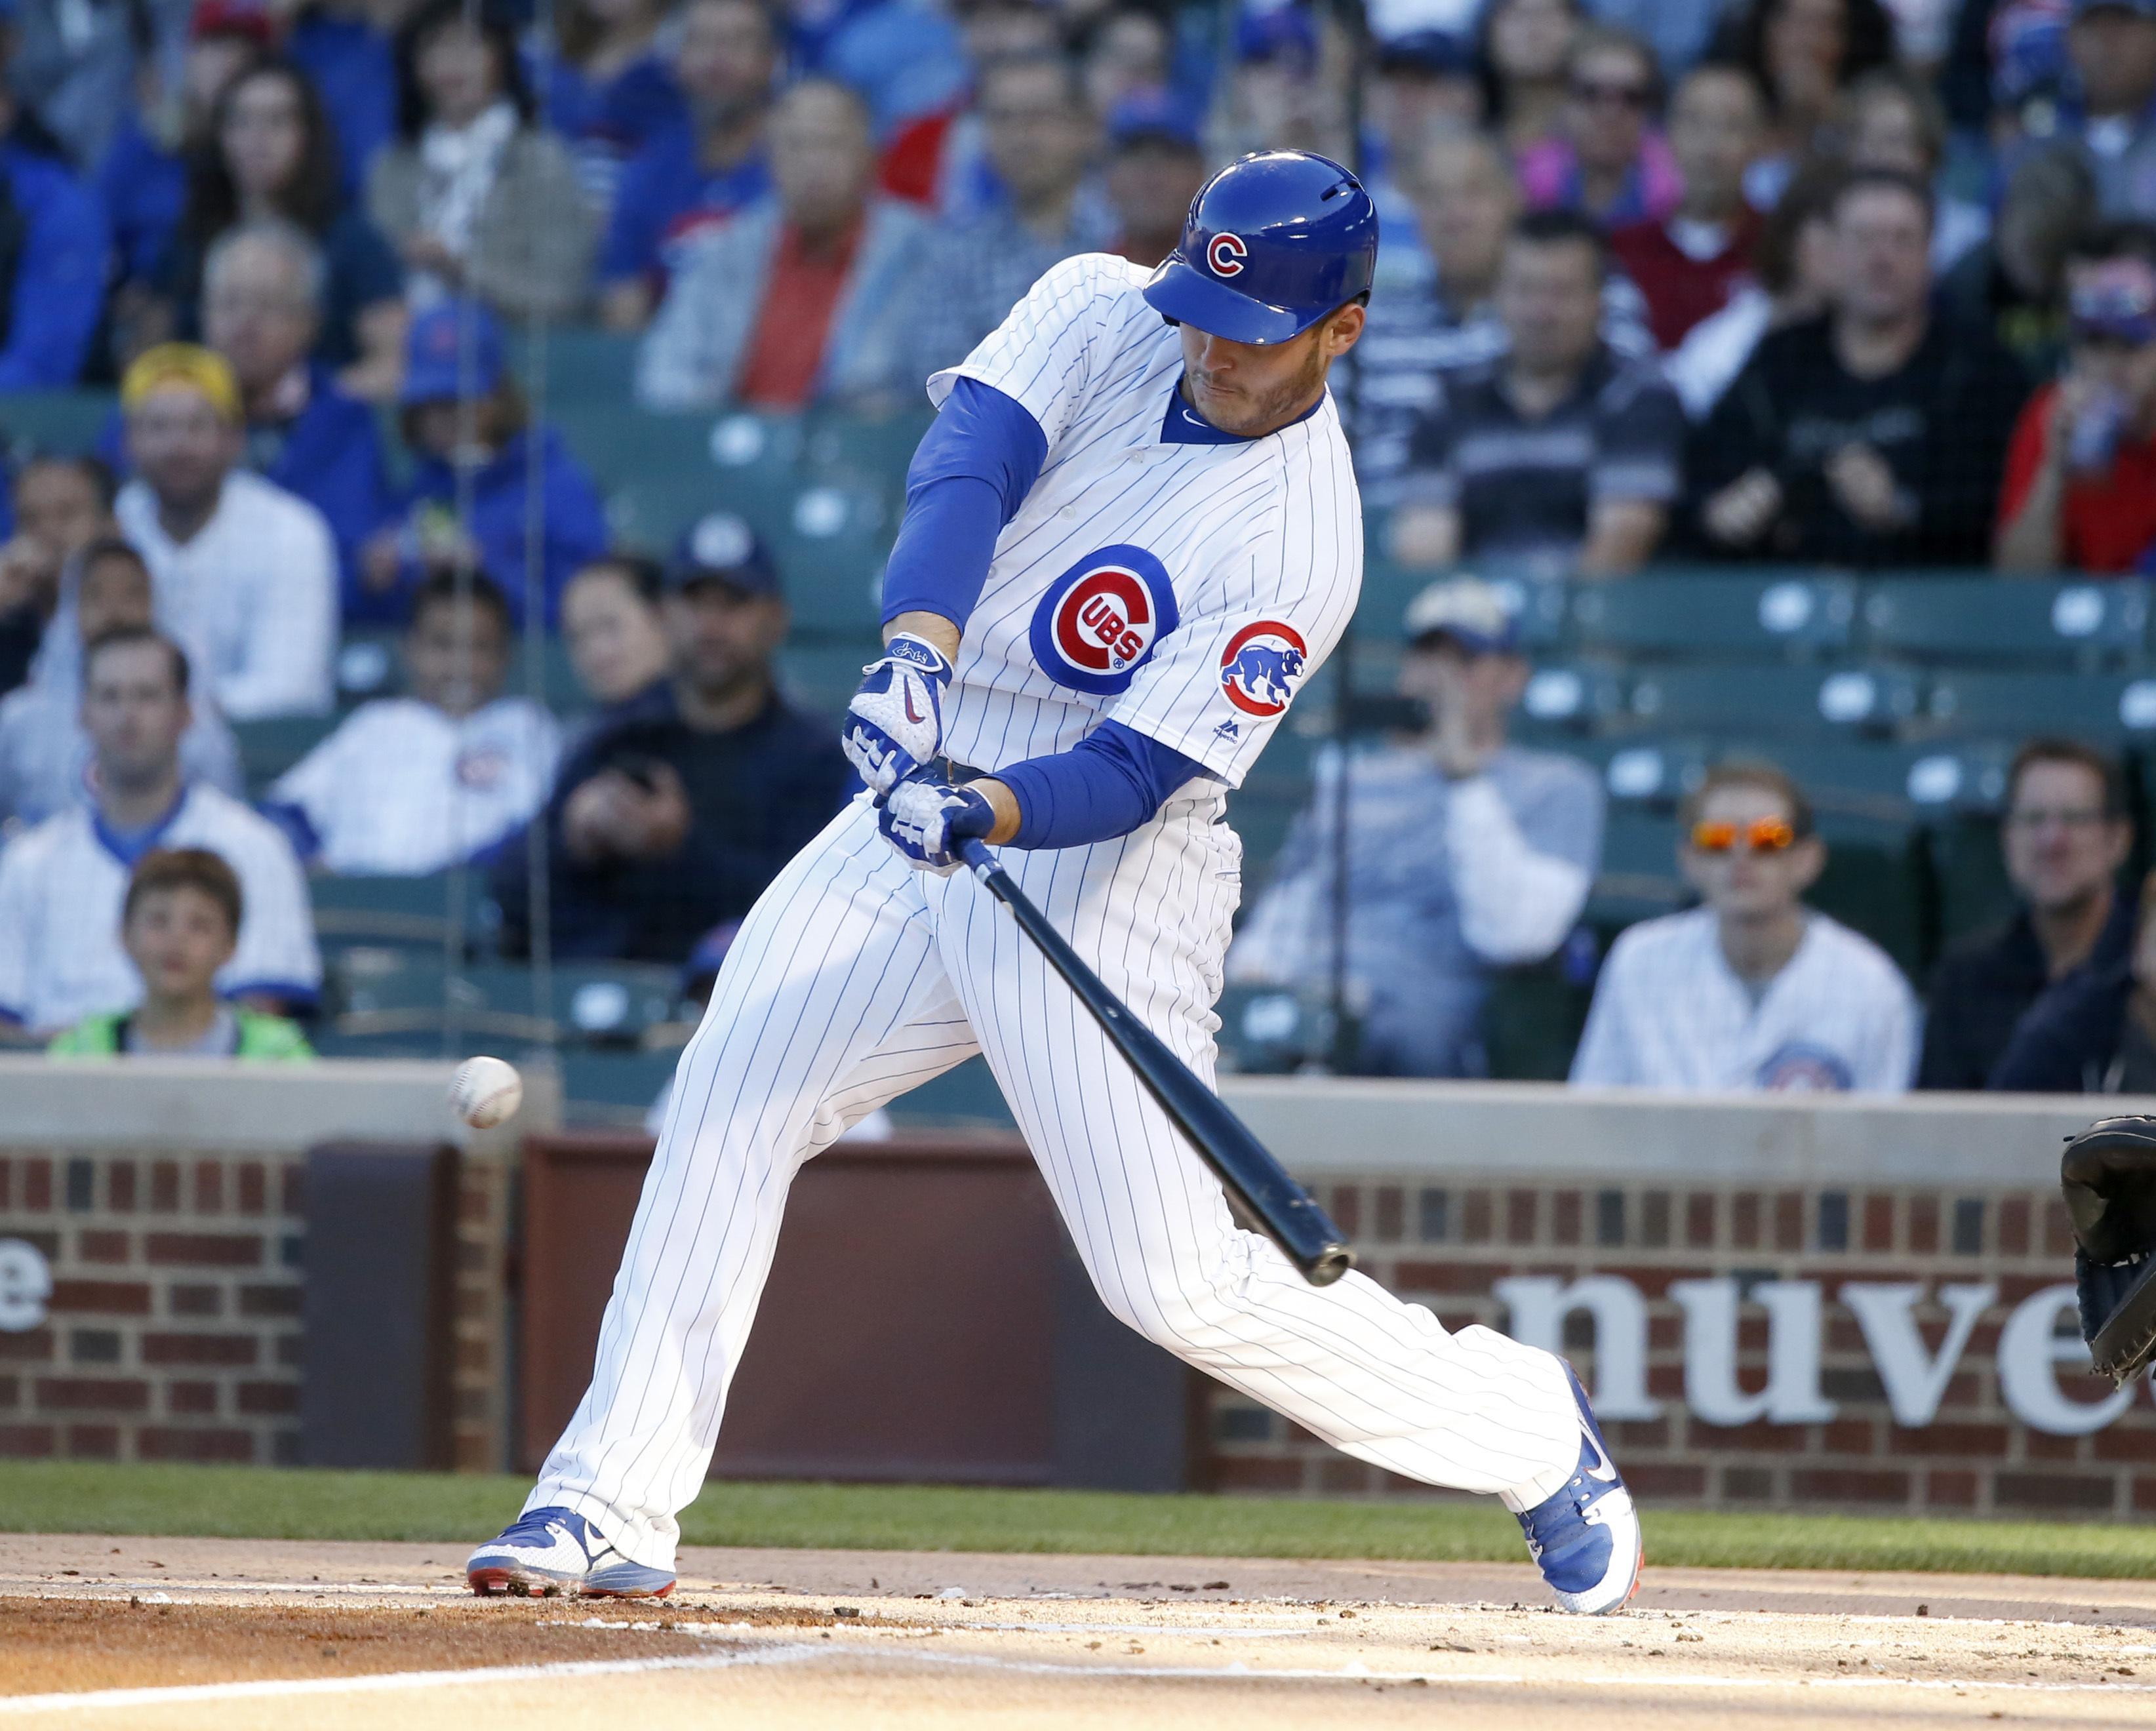 Padres_cubs_baseball_32479